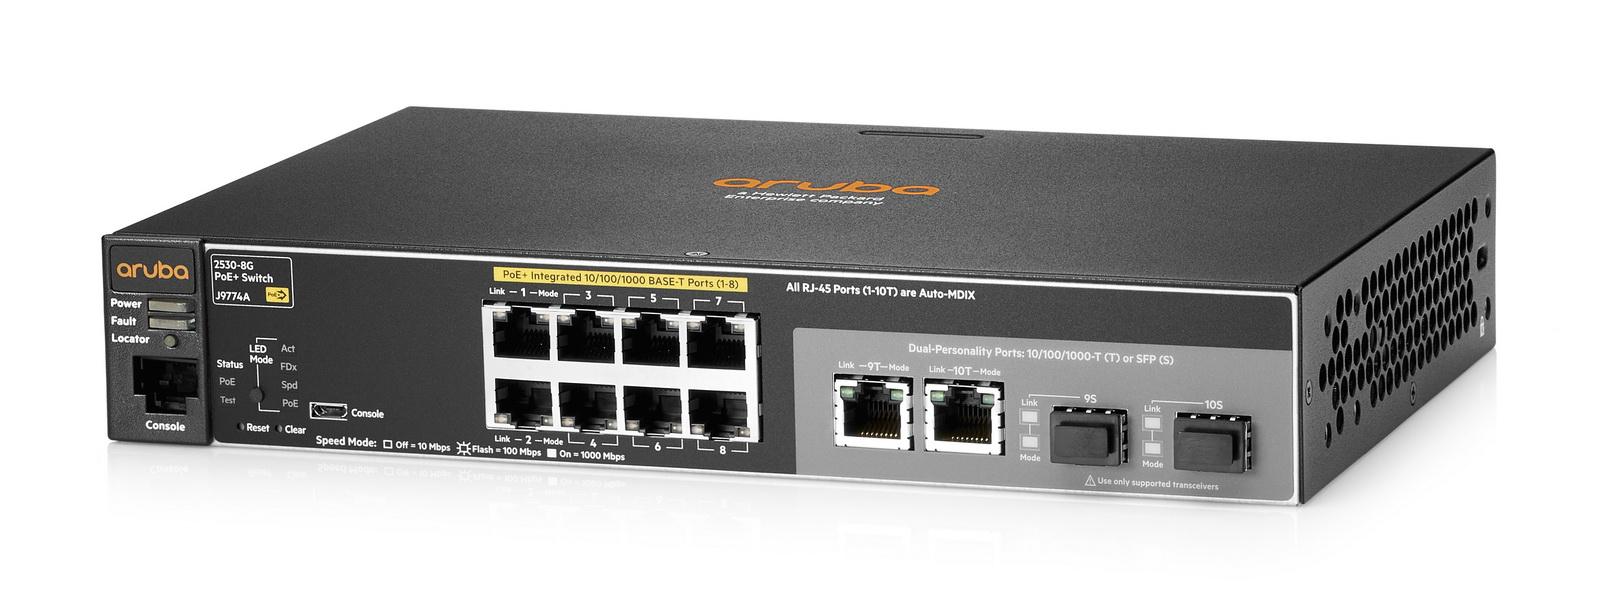 Hewlett Packard Enterprise Aruba 2530 8G PoE+ Managed L2 Gigabit Ethernet (10/100/1000) Black 1U Power over Ethernet (PoE)